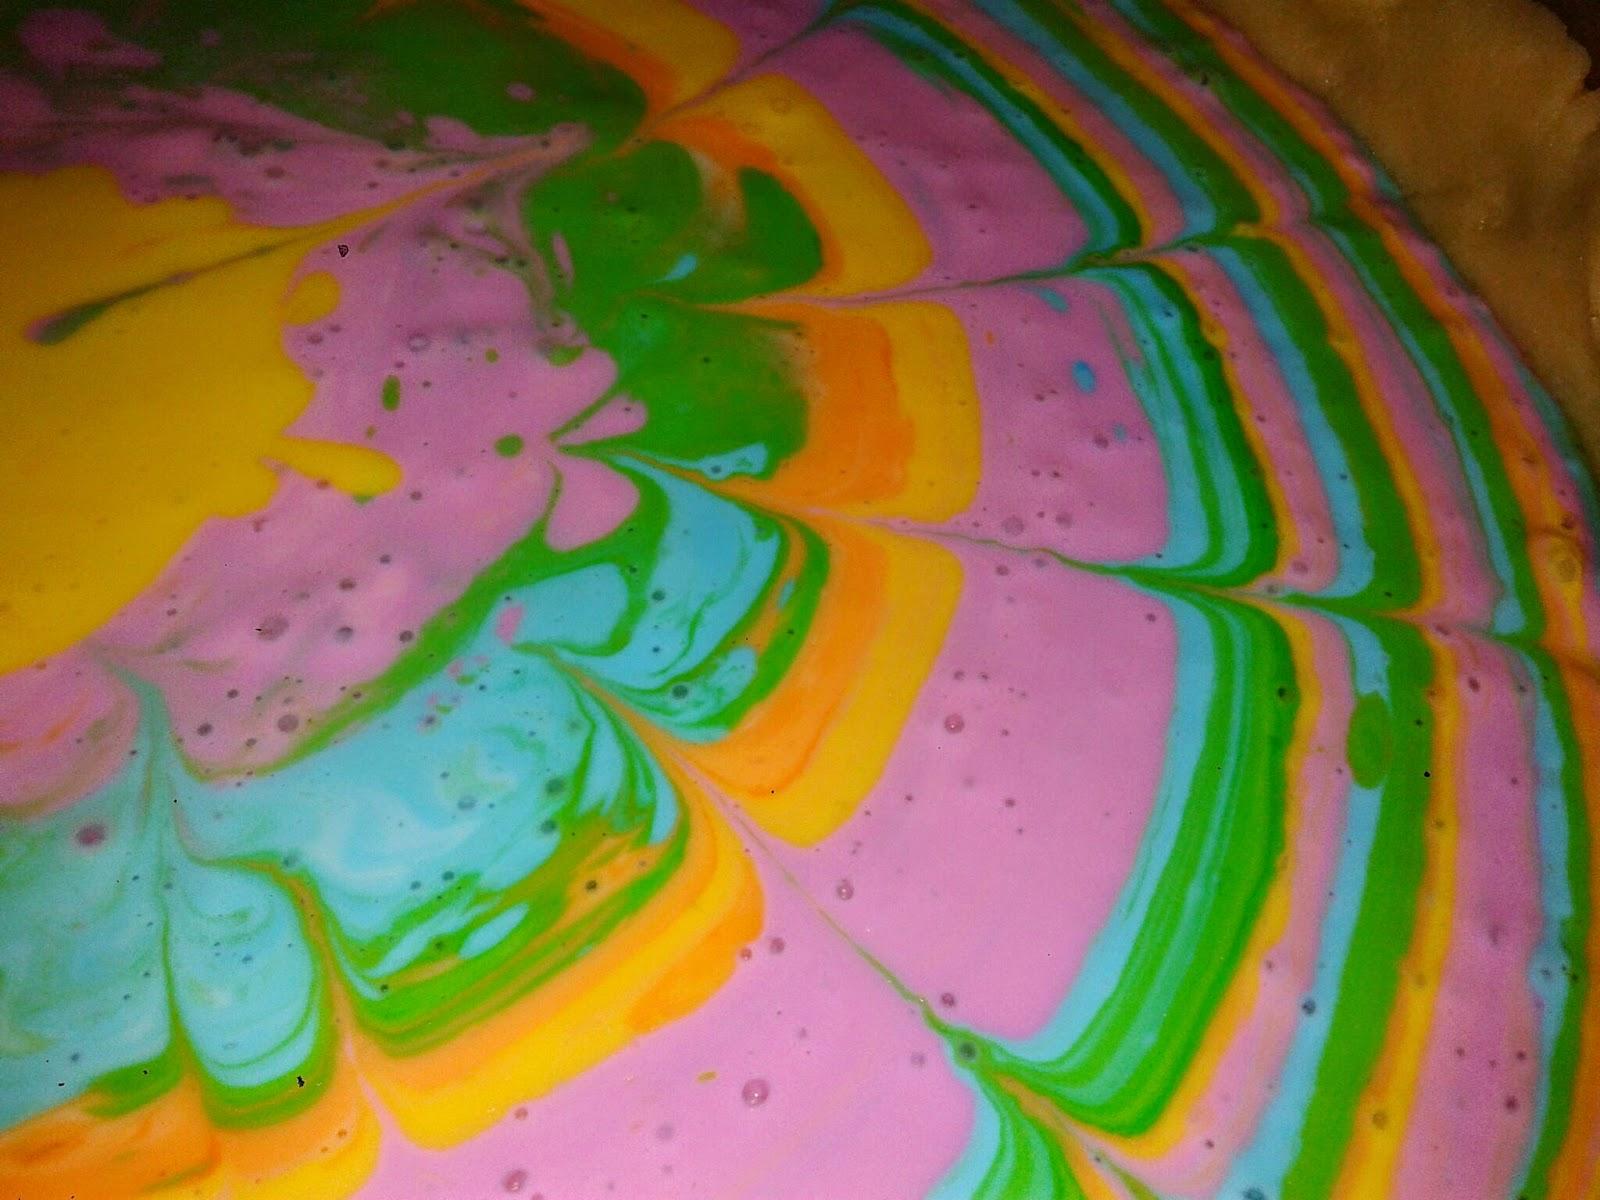 Süße Sünden selbst gebacken: Kunterbunter Käsekuchen